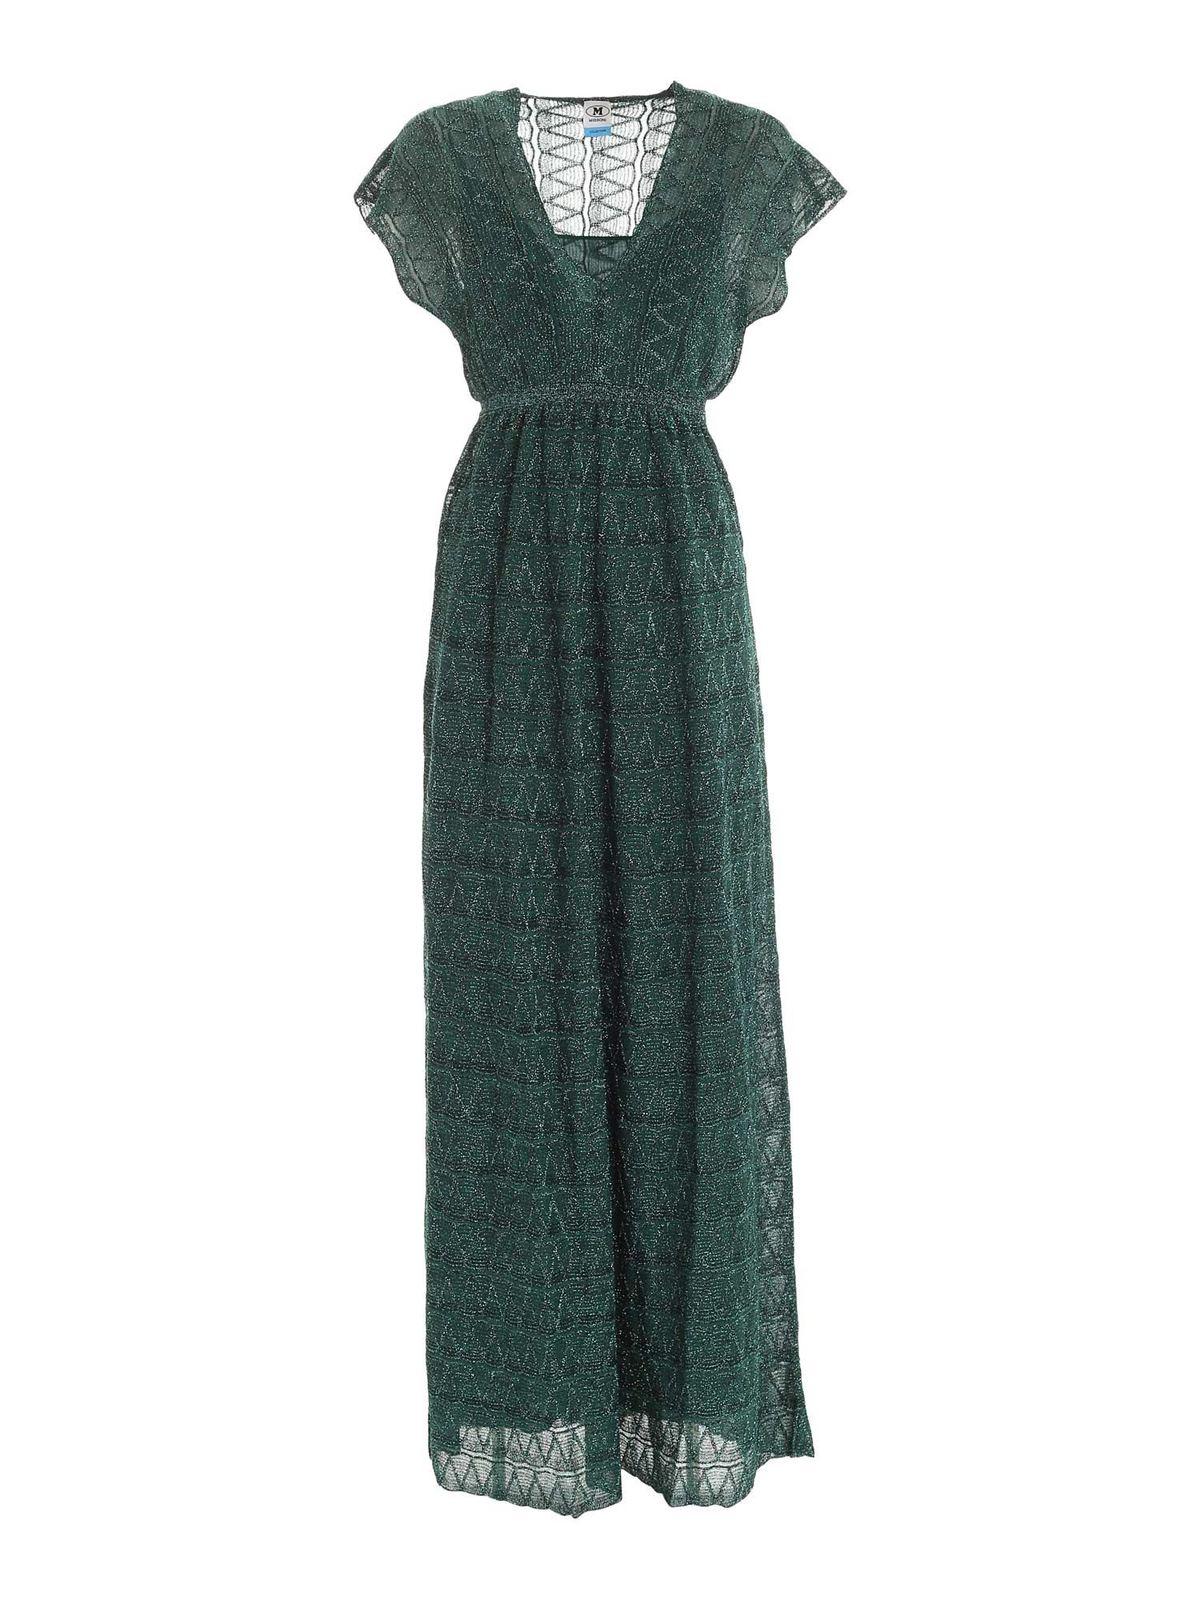 M Missoni LAME PATTERN DRESS IN GREEN